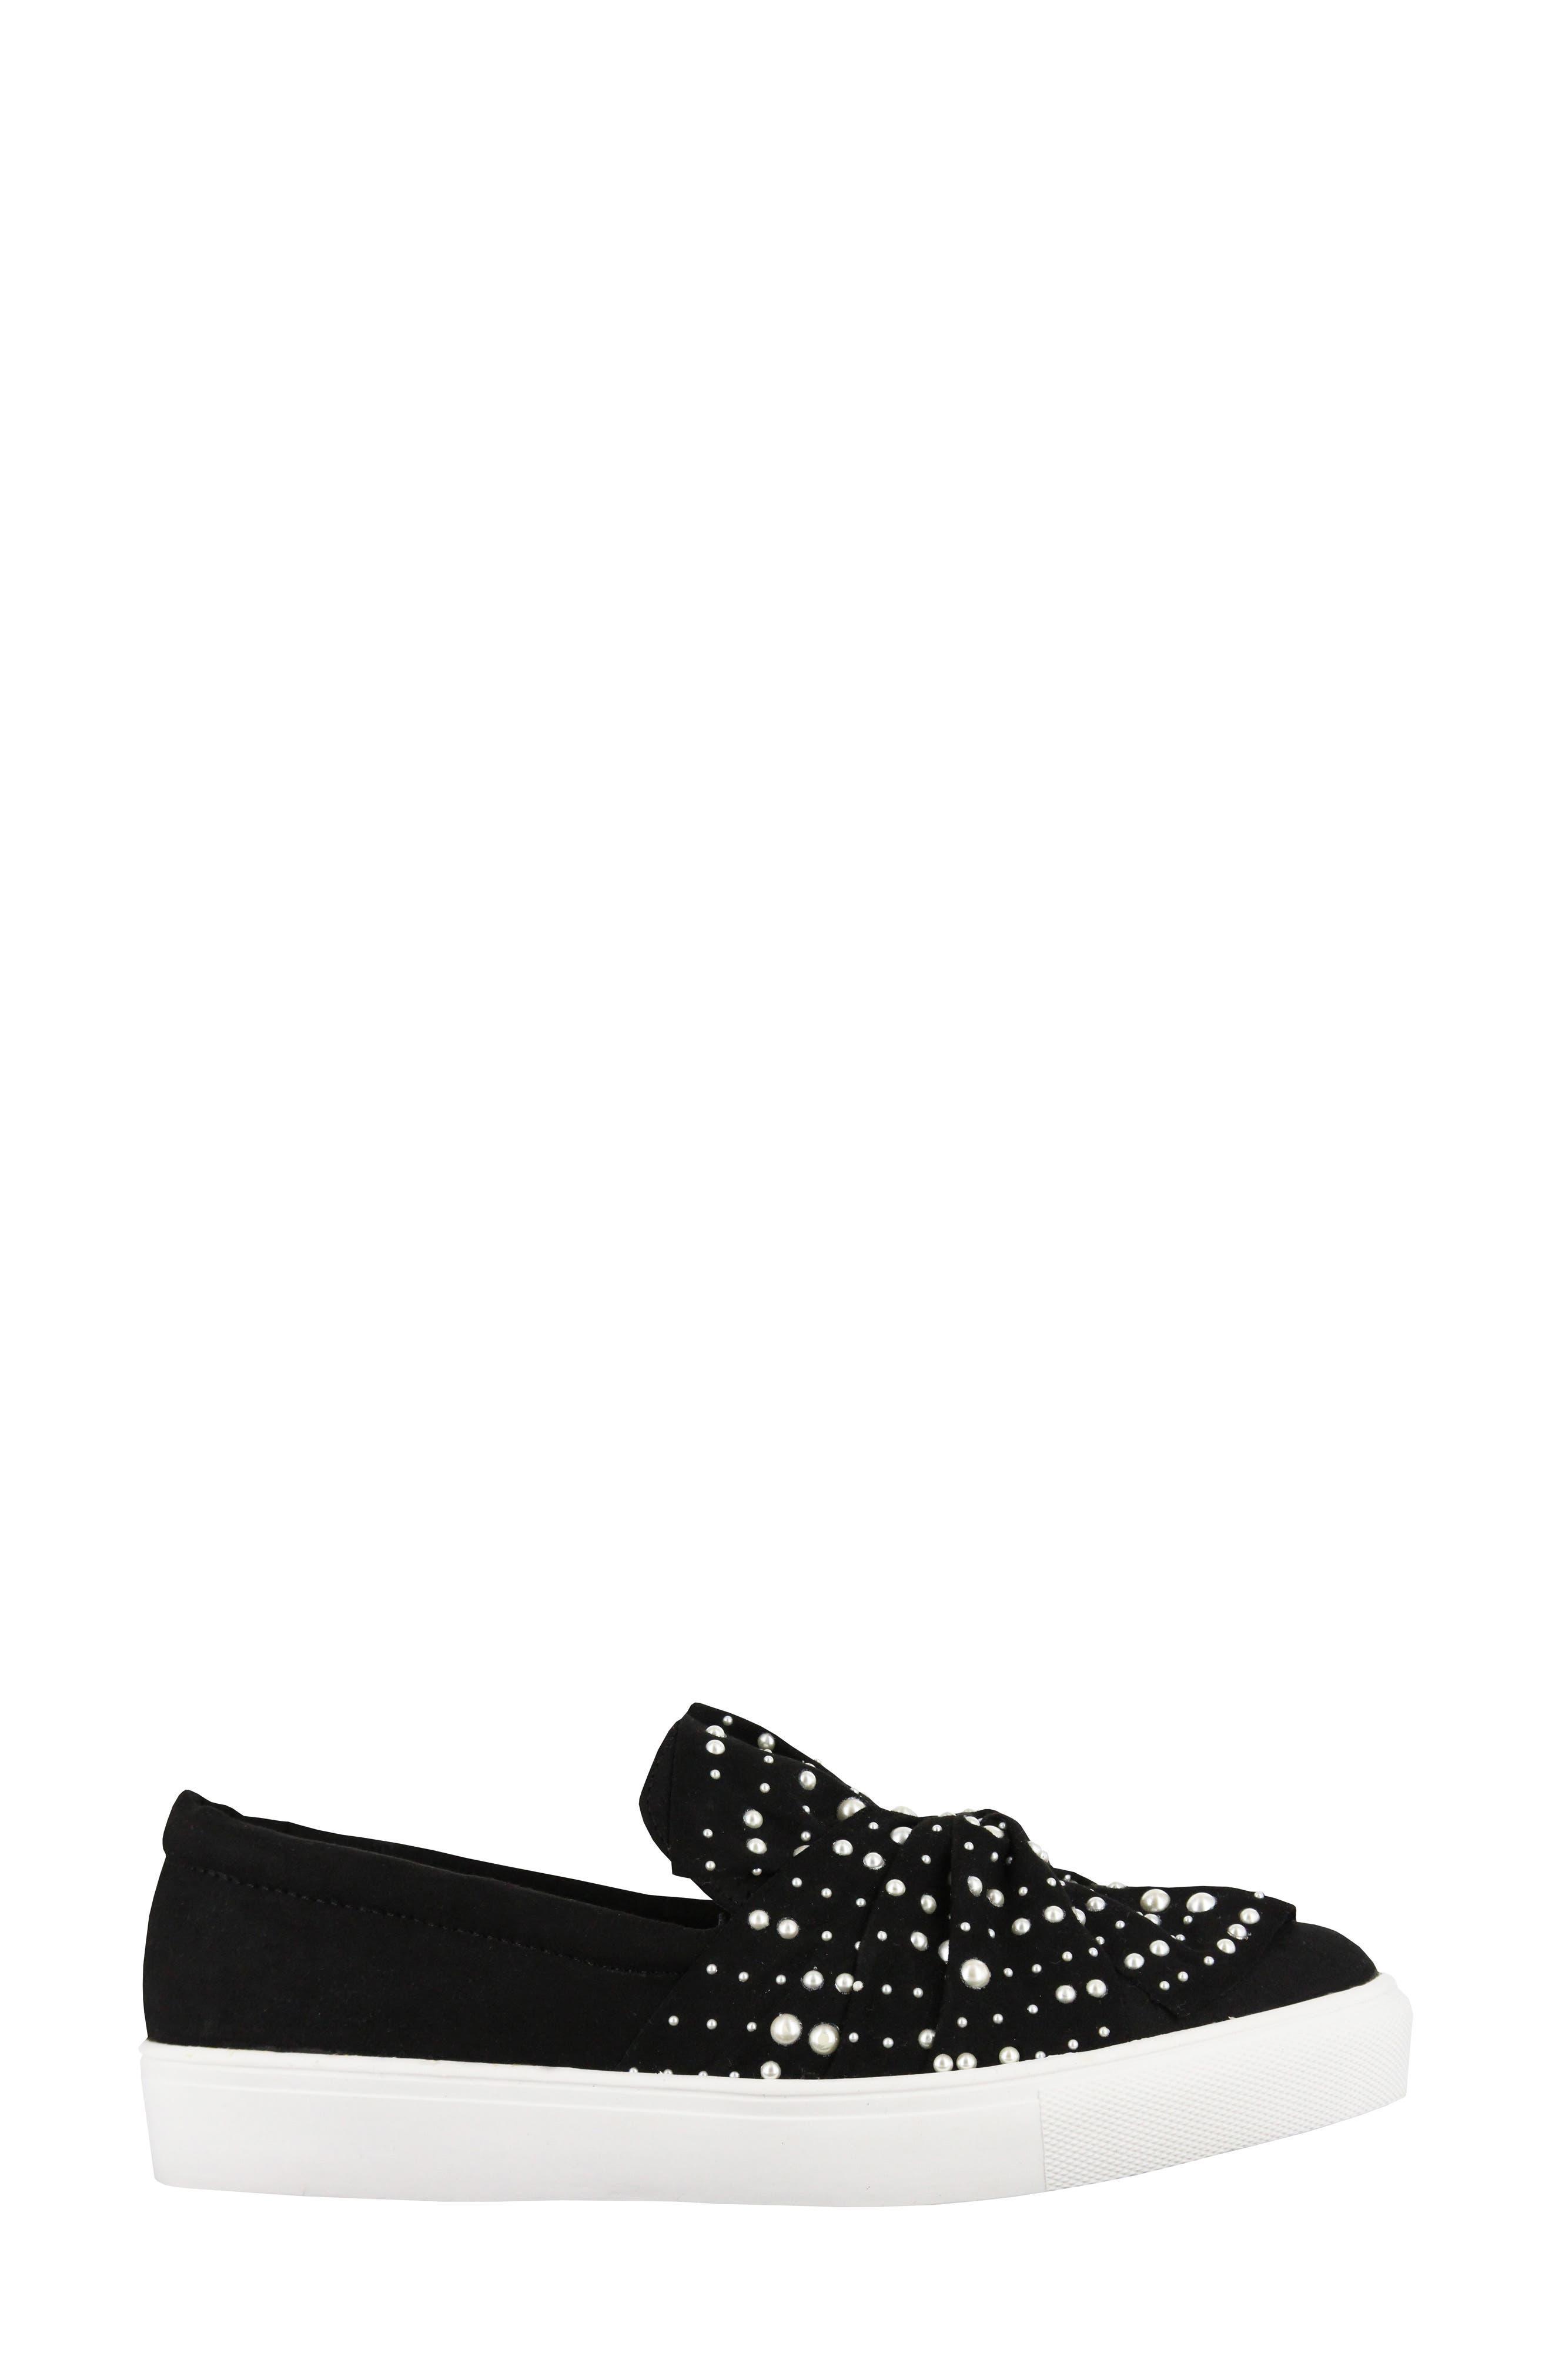 Aretha Embellished Slip-On Sneaker,                             Alternate thumbnail 3, color,